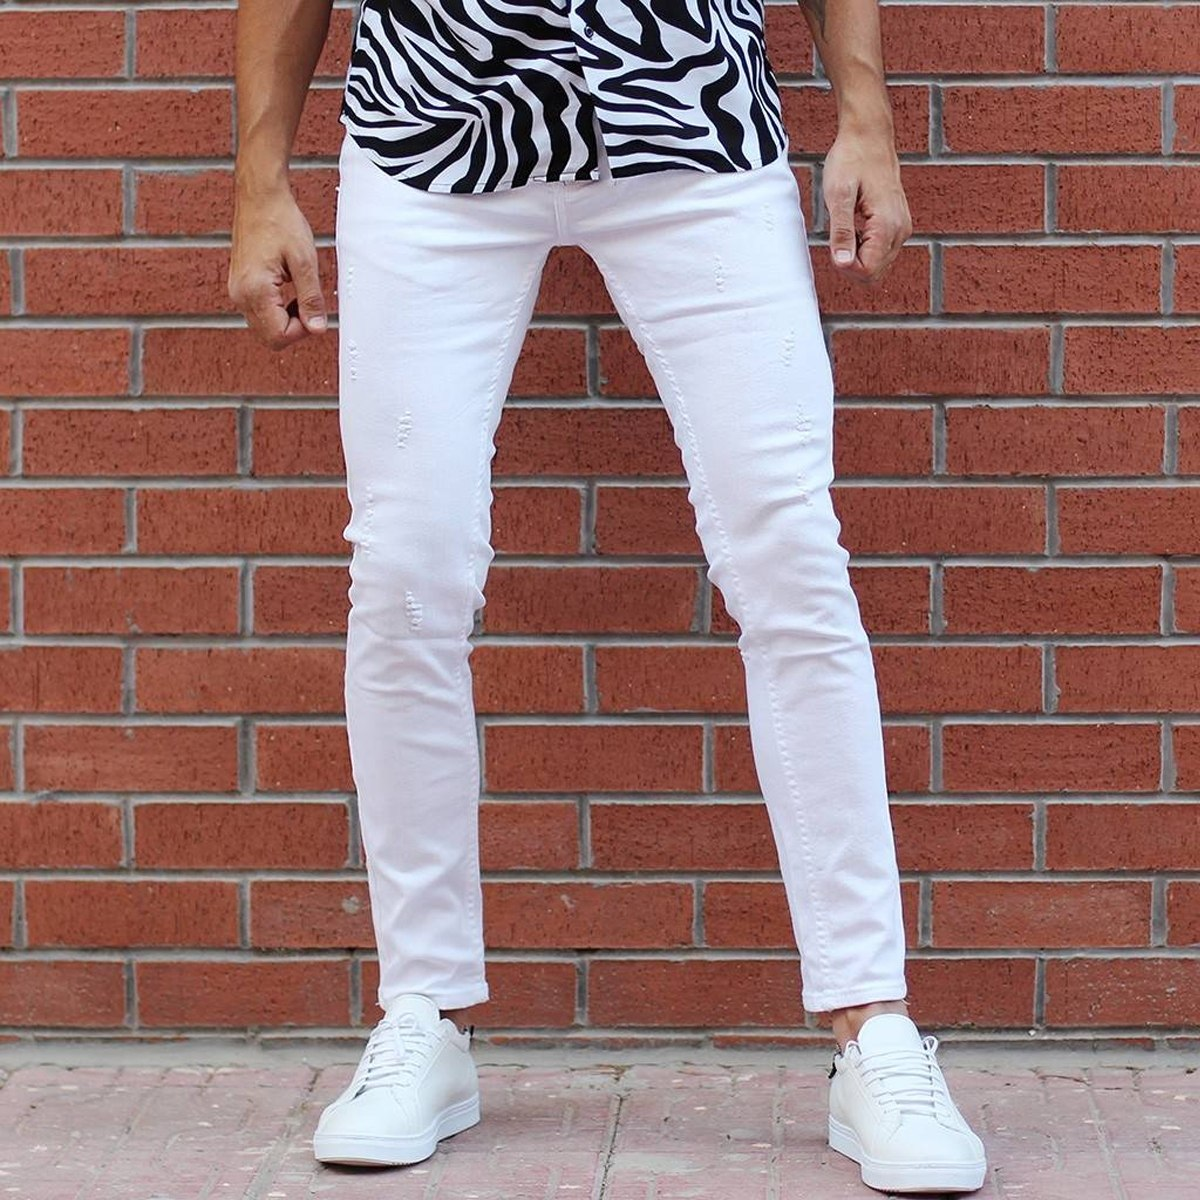 Men's Laser Cut Stretch Jeans In White